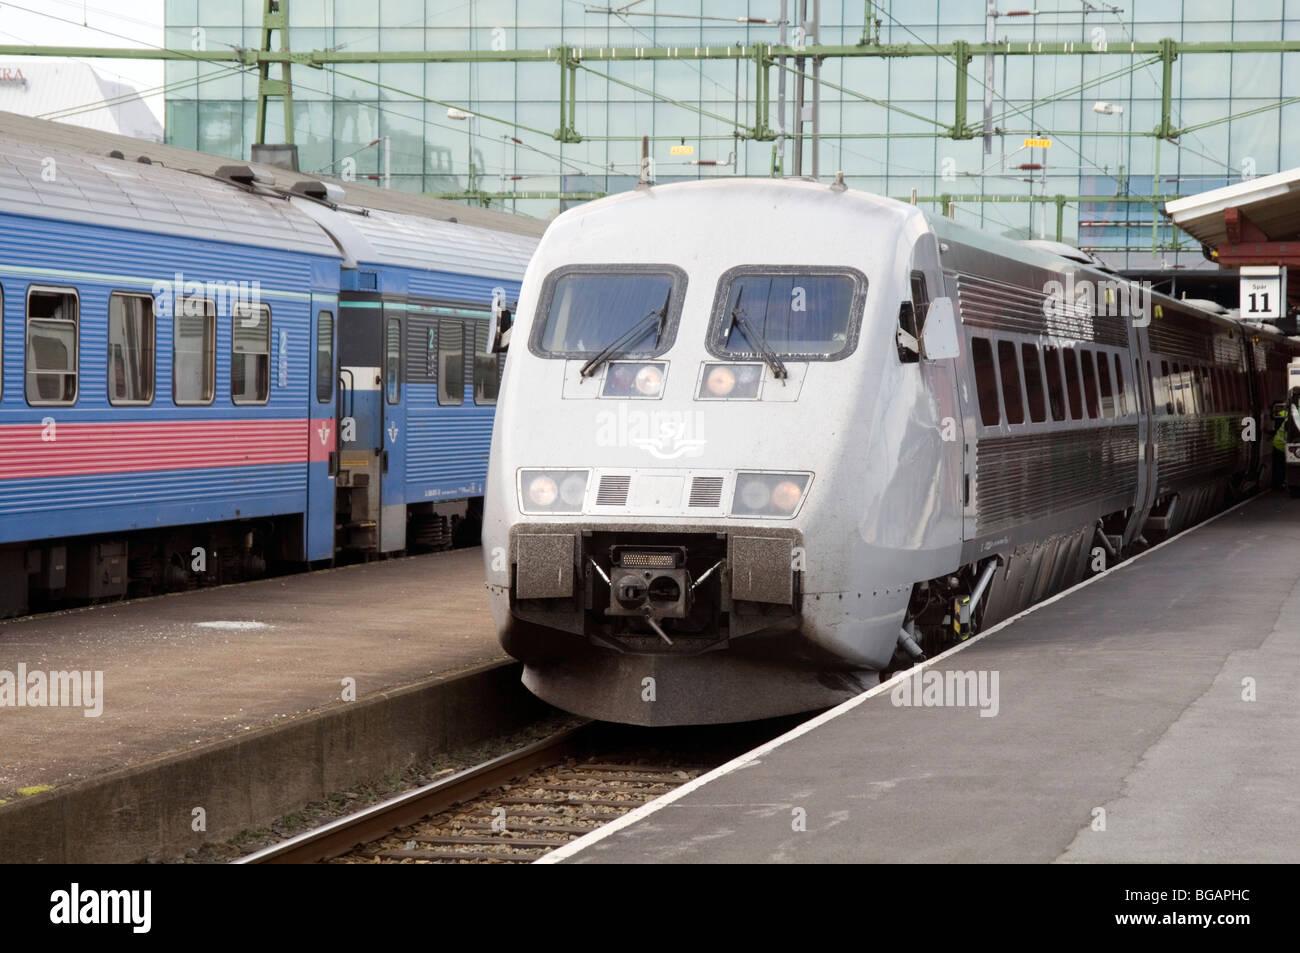 x2000 high speed swedish train trains tilting tilt leaning sweden station - Stock Image